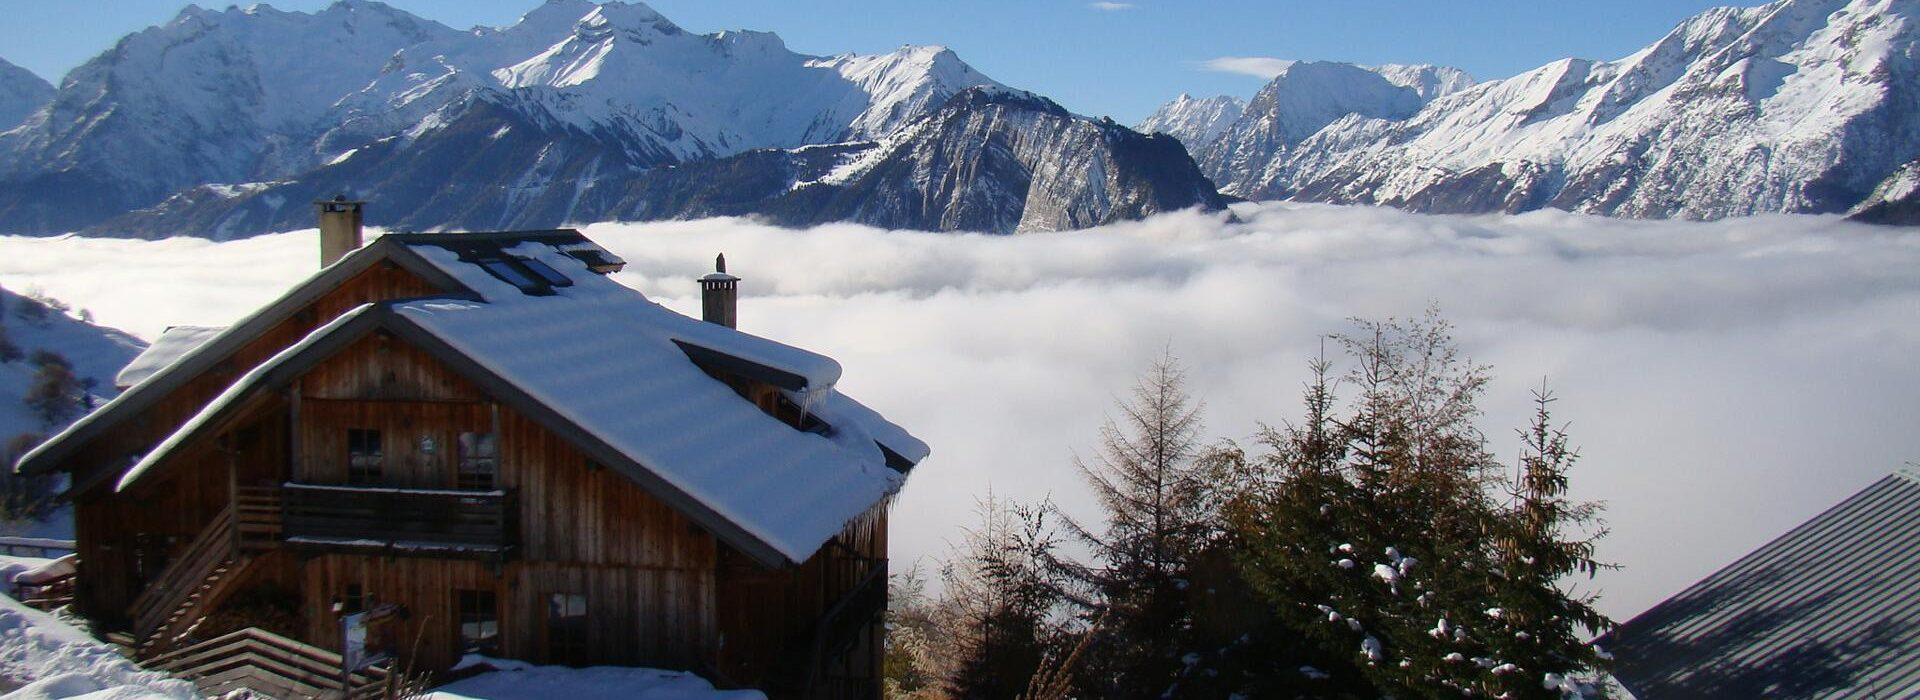 Chalet en bergen